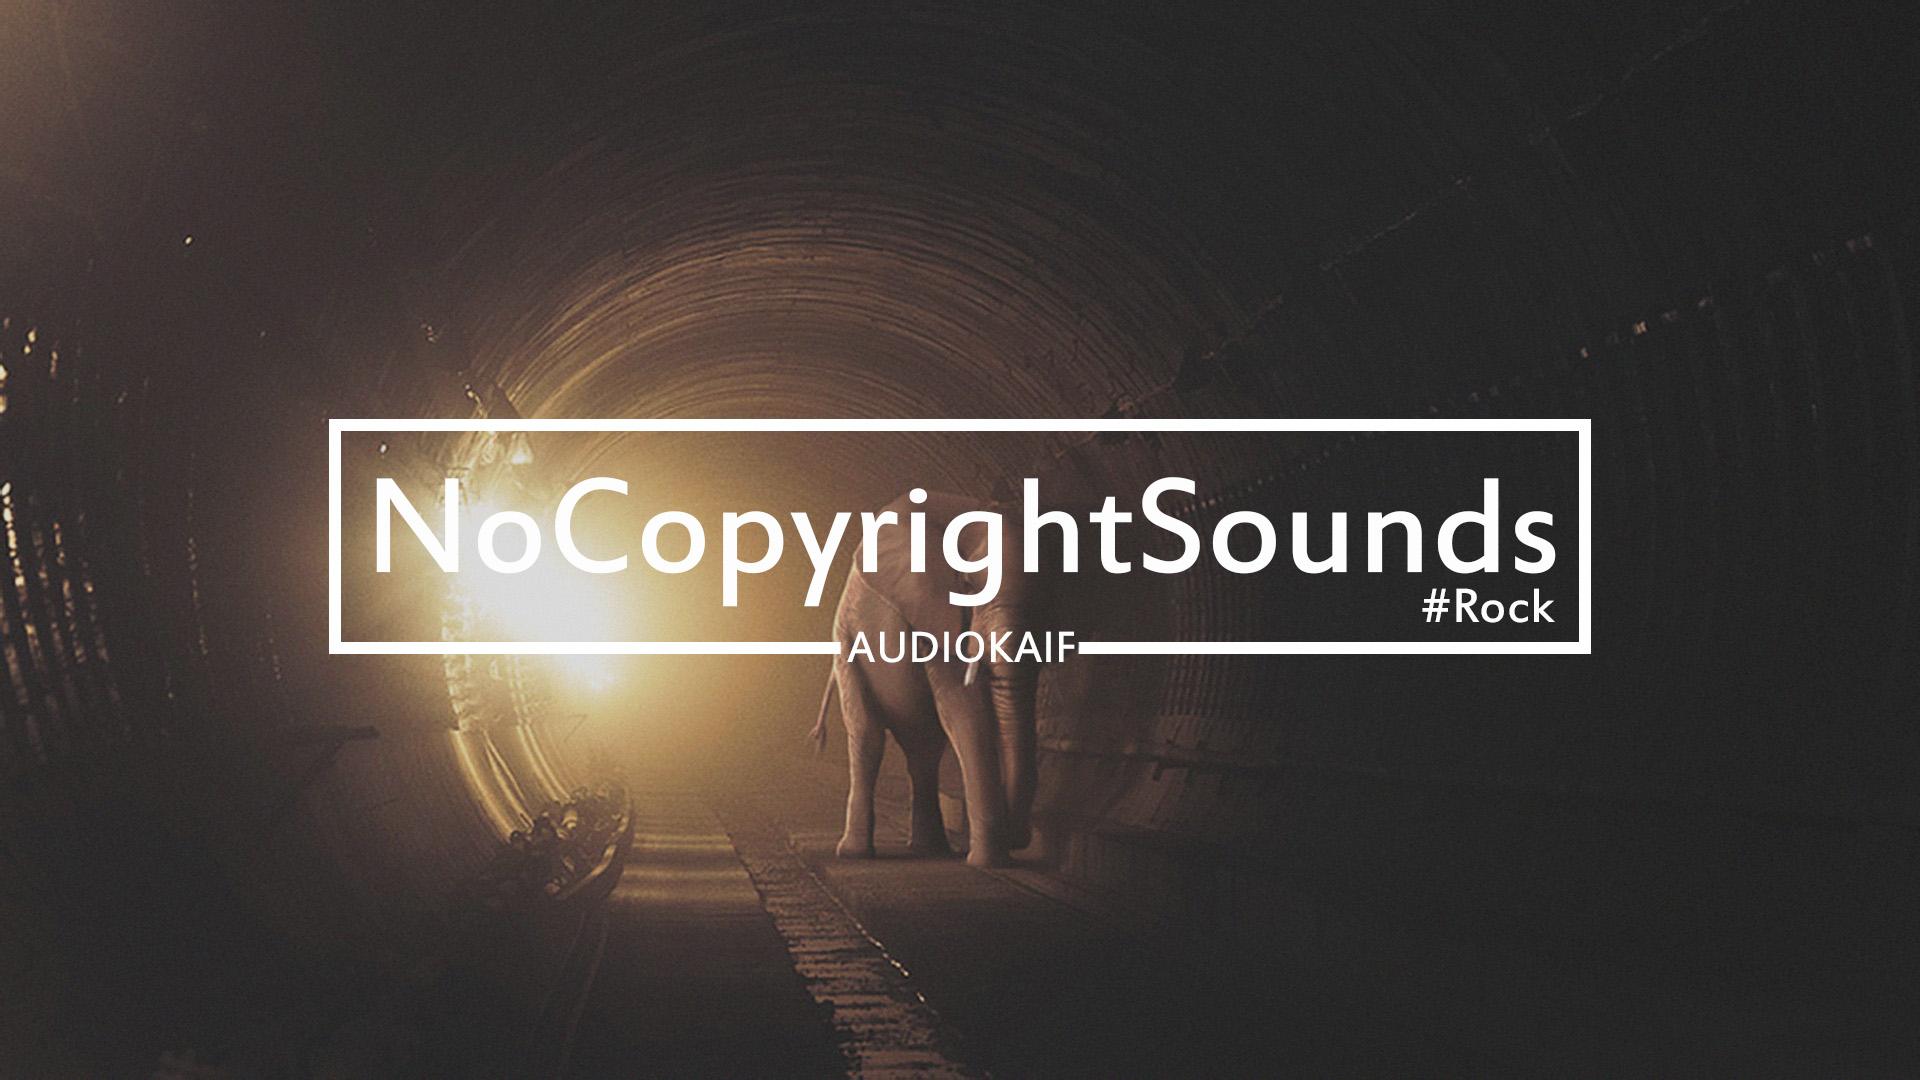 Музыка без авторского права Stuck In The Middle  Rock музыка ютуб видео